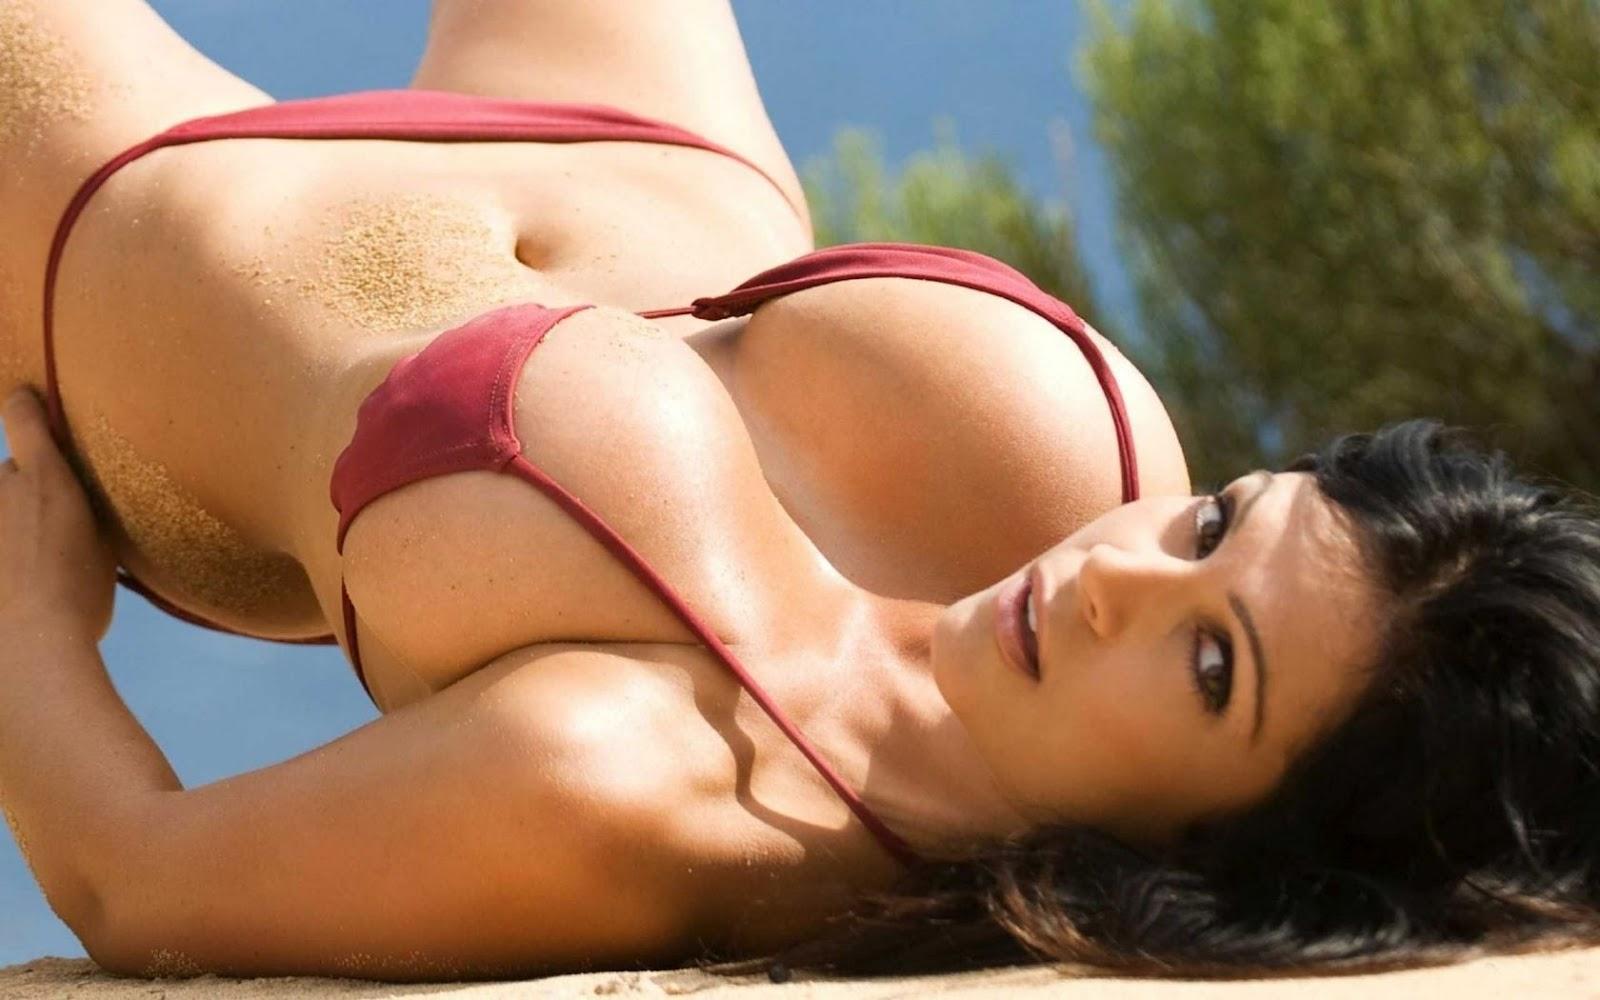 bikini-women-videos